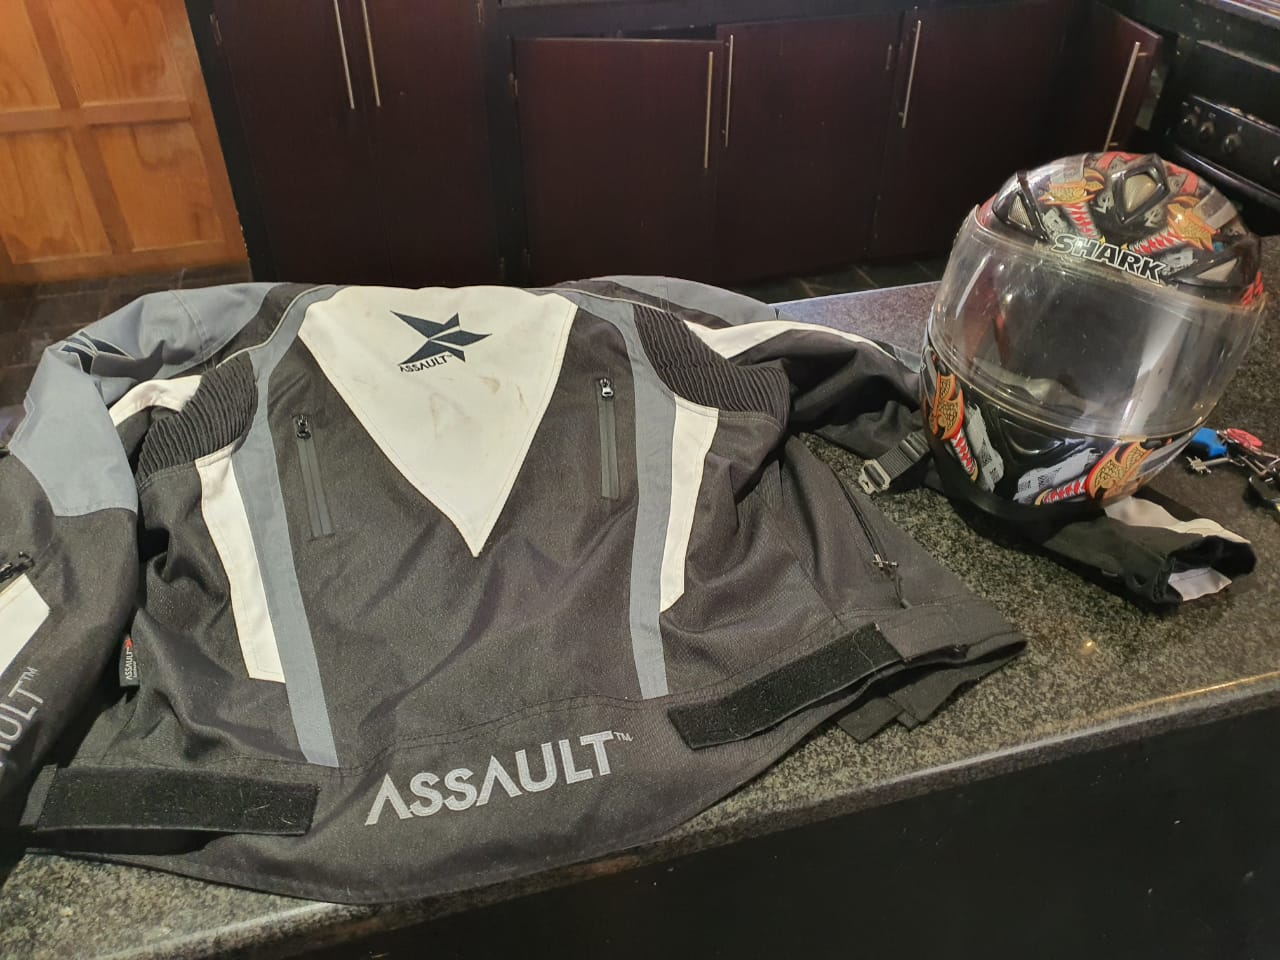 Assault bike jacket medium for sale